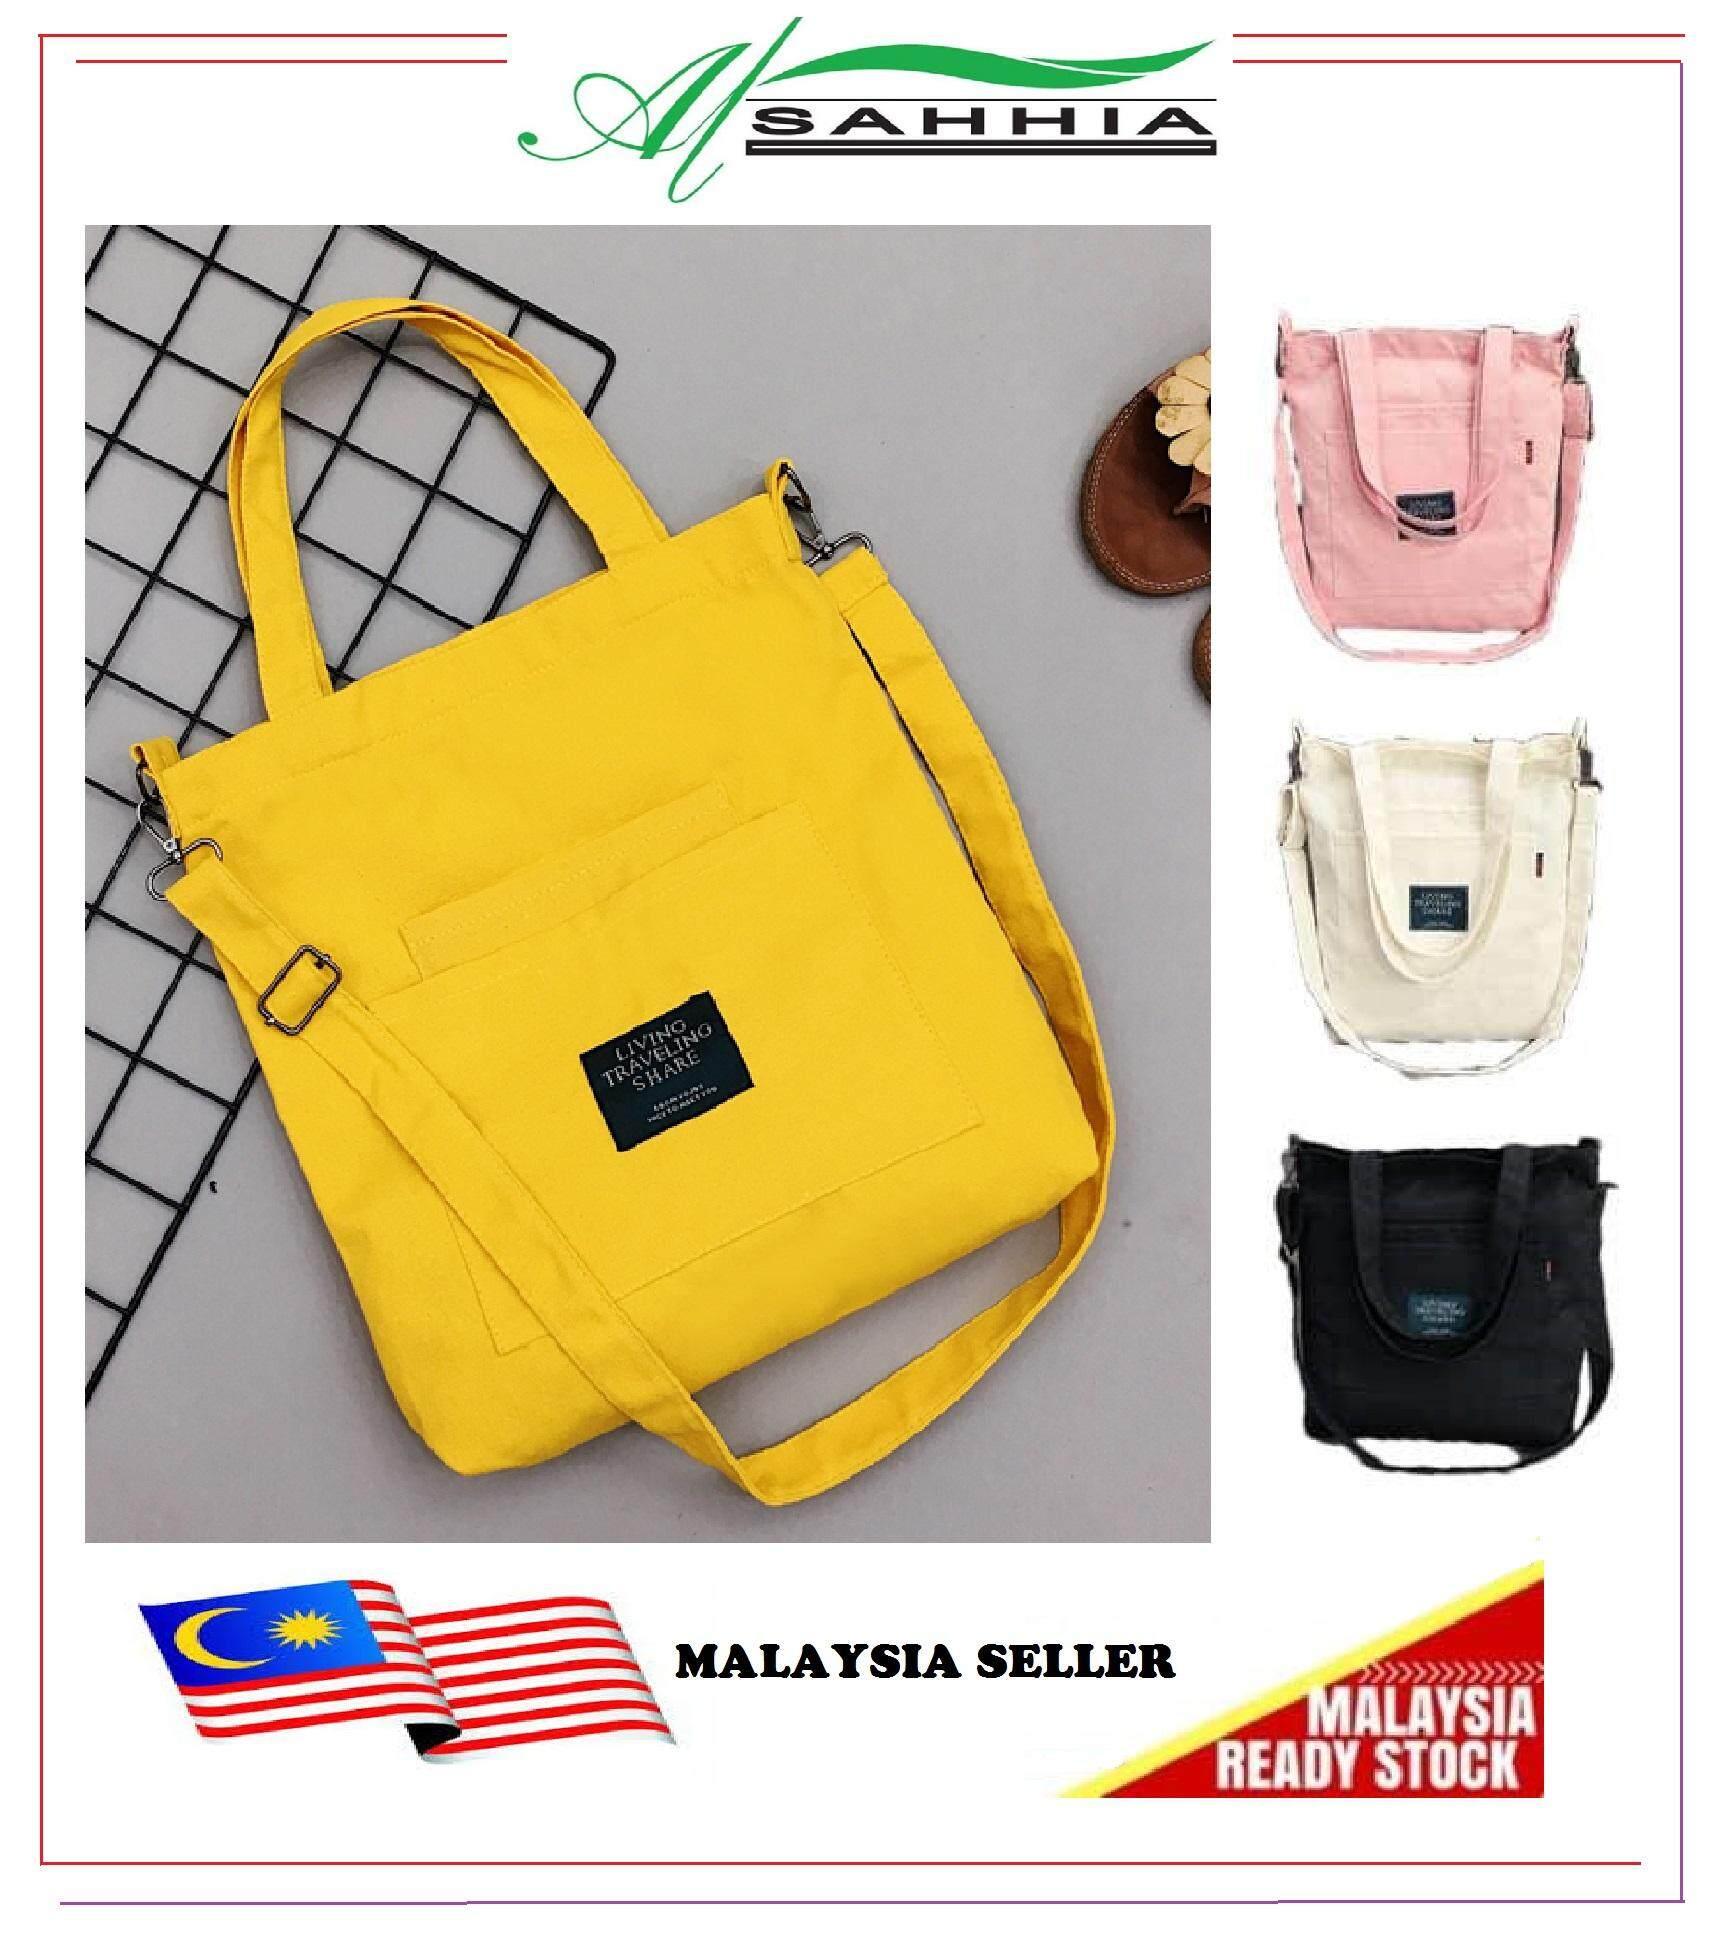 b74406338c2c 4R2 Al Sahhia Fashion Korean Style Design Women Linen Canvas Sling Bag  Shell Casual Large Bucket Tote Shoulder Bag